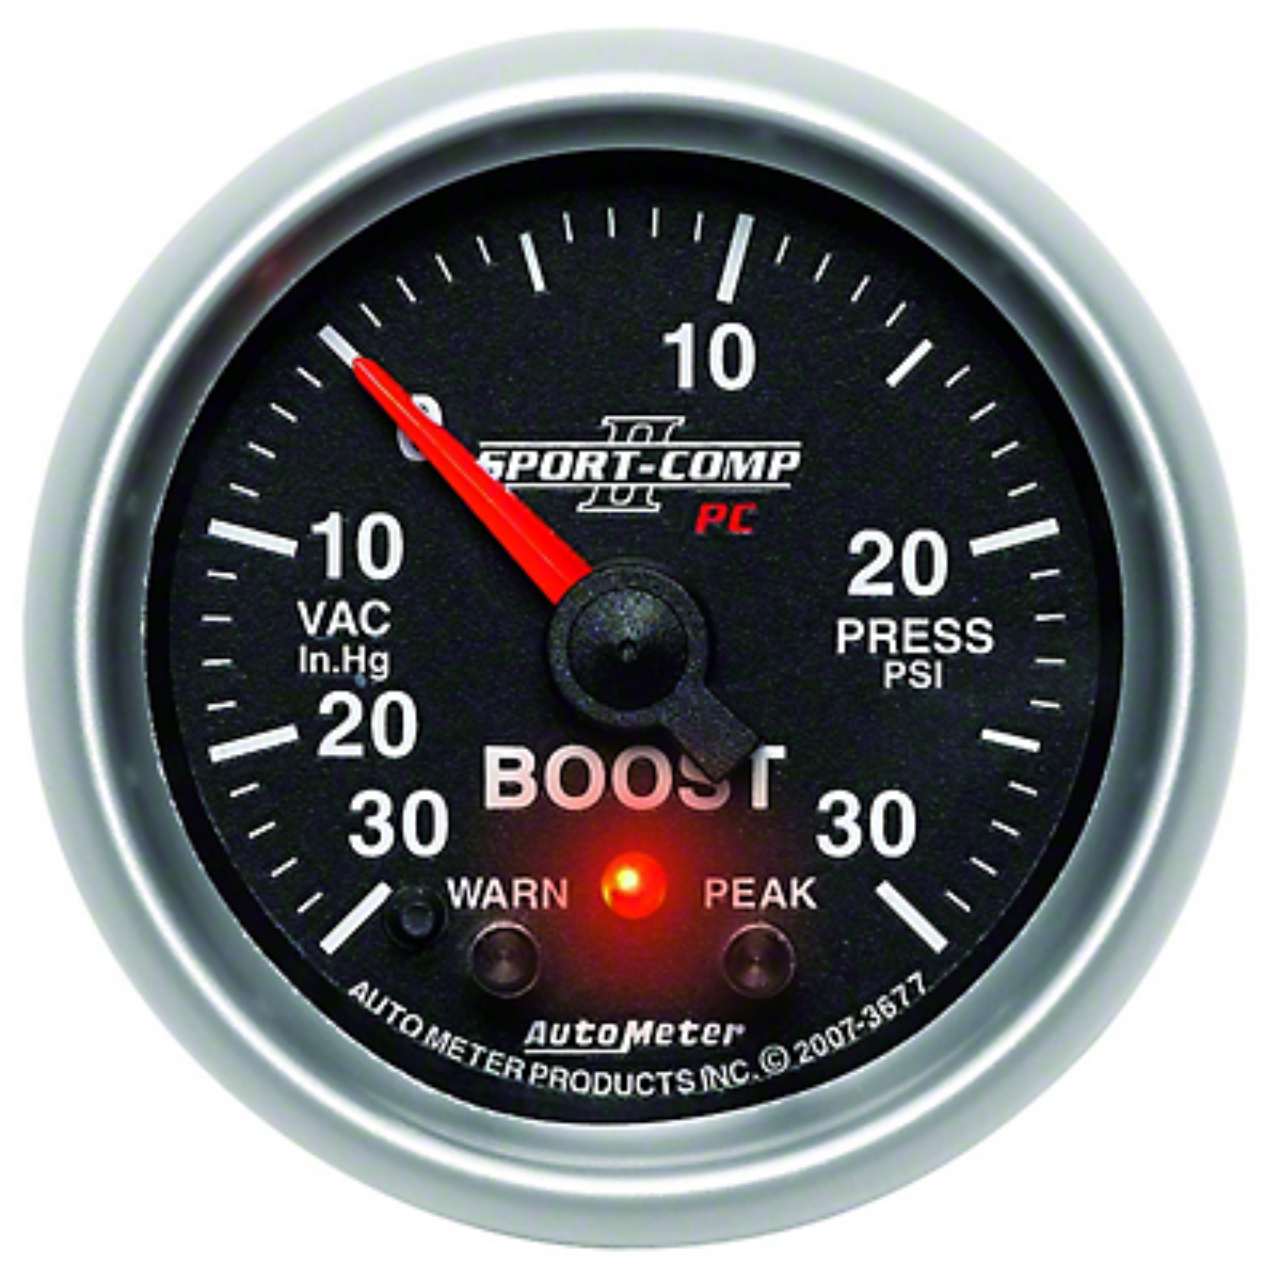 Auto Meter Sport Comp II Boost/Vac Gauge - 30psi Electric (79-17 All)